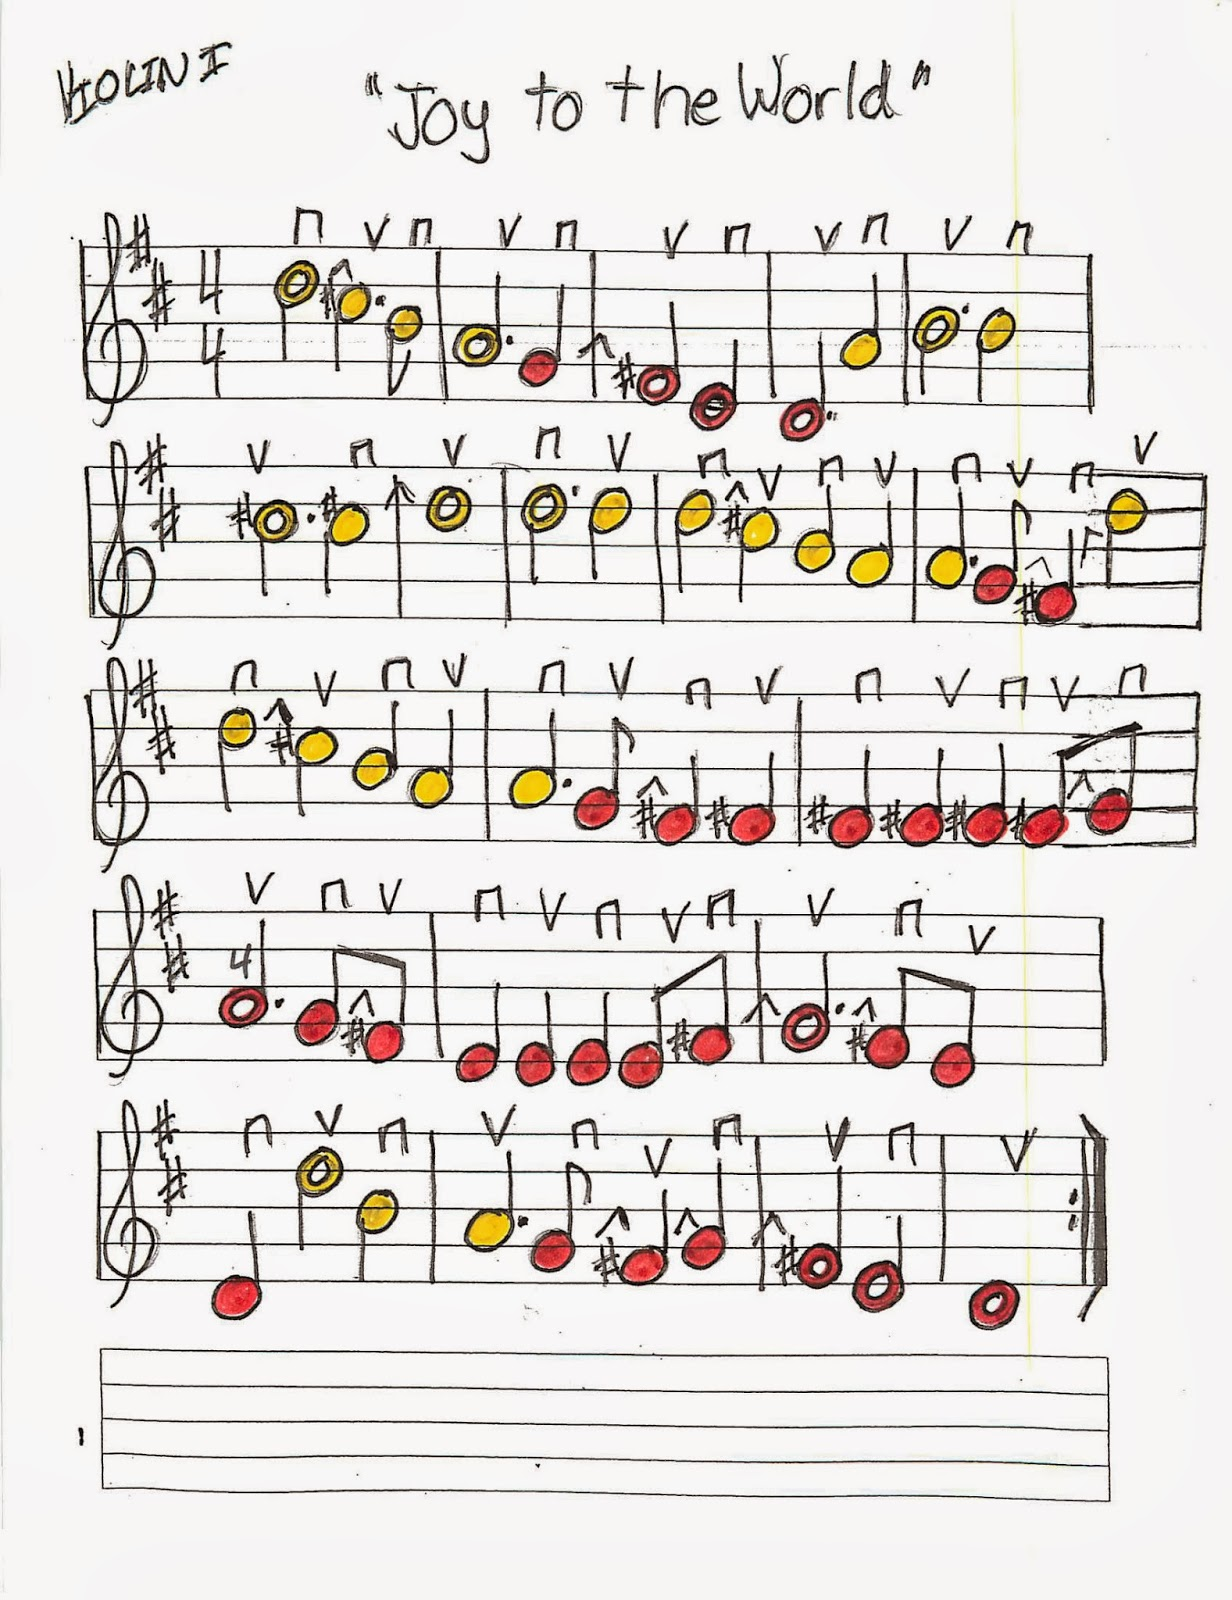 Ode To Joy Sheet Music For Beginner Violin